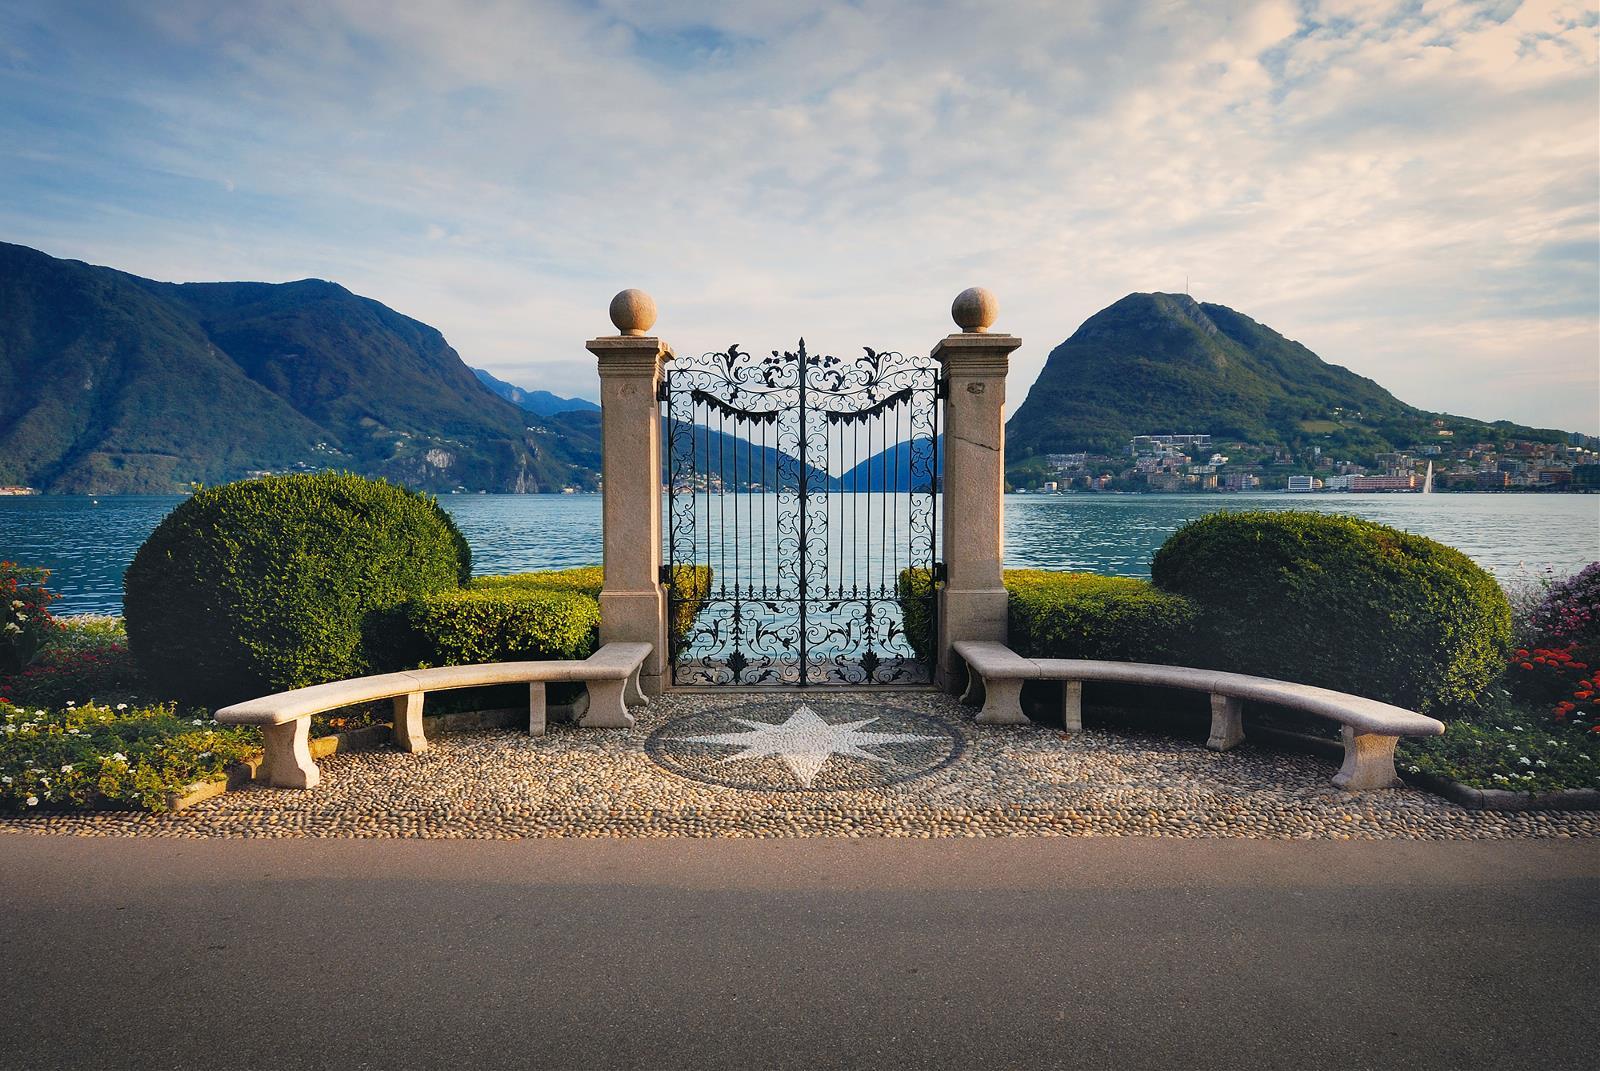 Breve guida per visitare Lugano in un week end